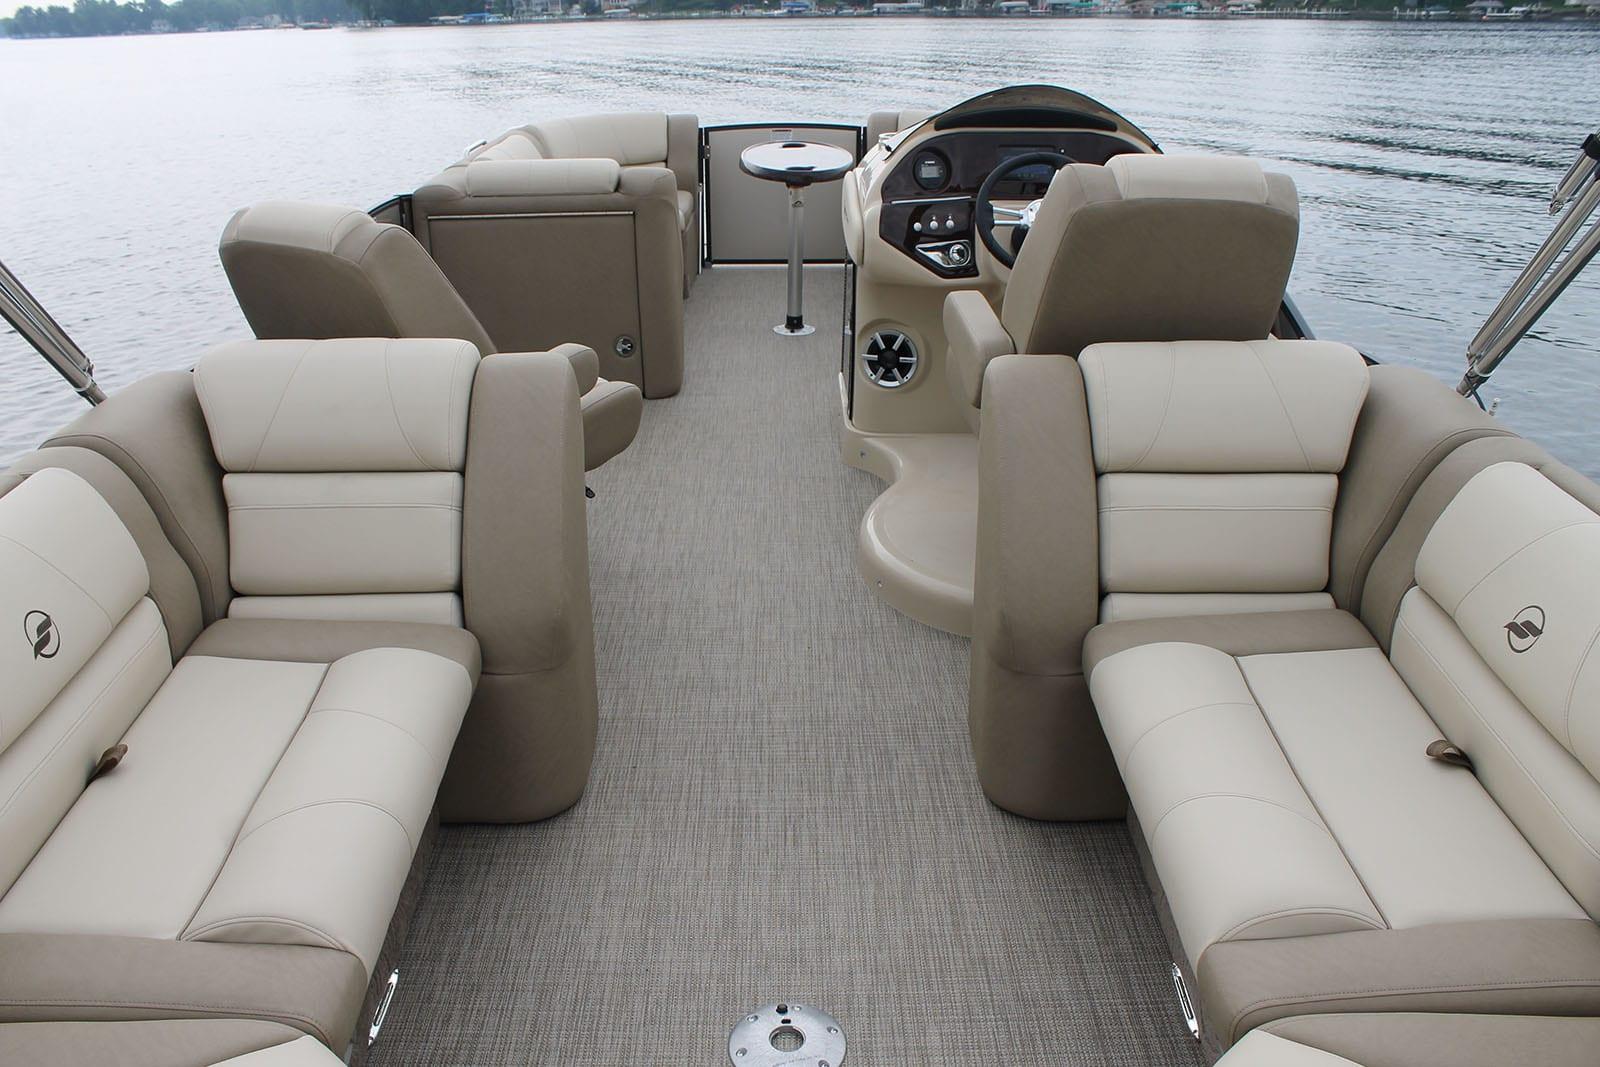 Starcraft mx pontoon lee county inboard for Pontoon boat interior designs